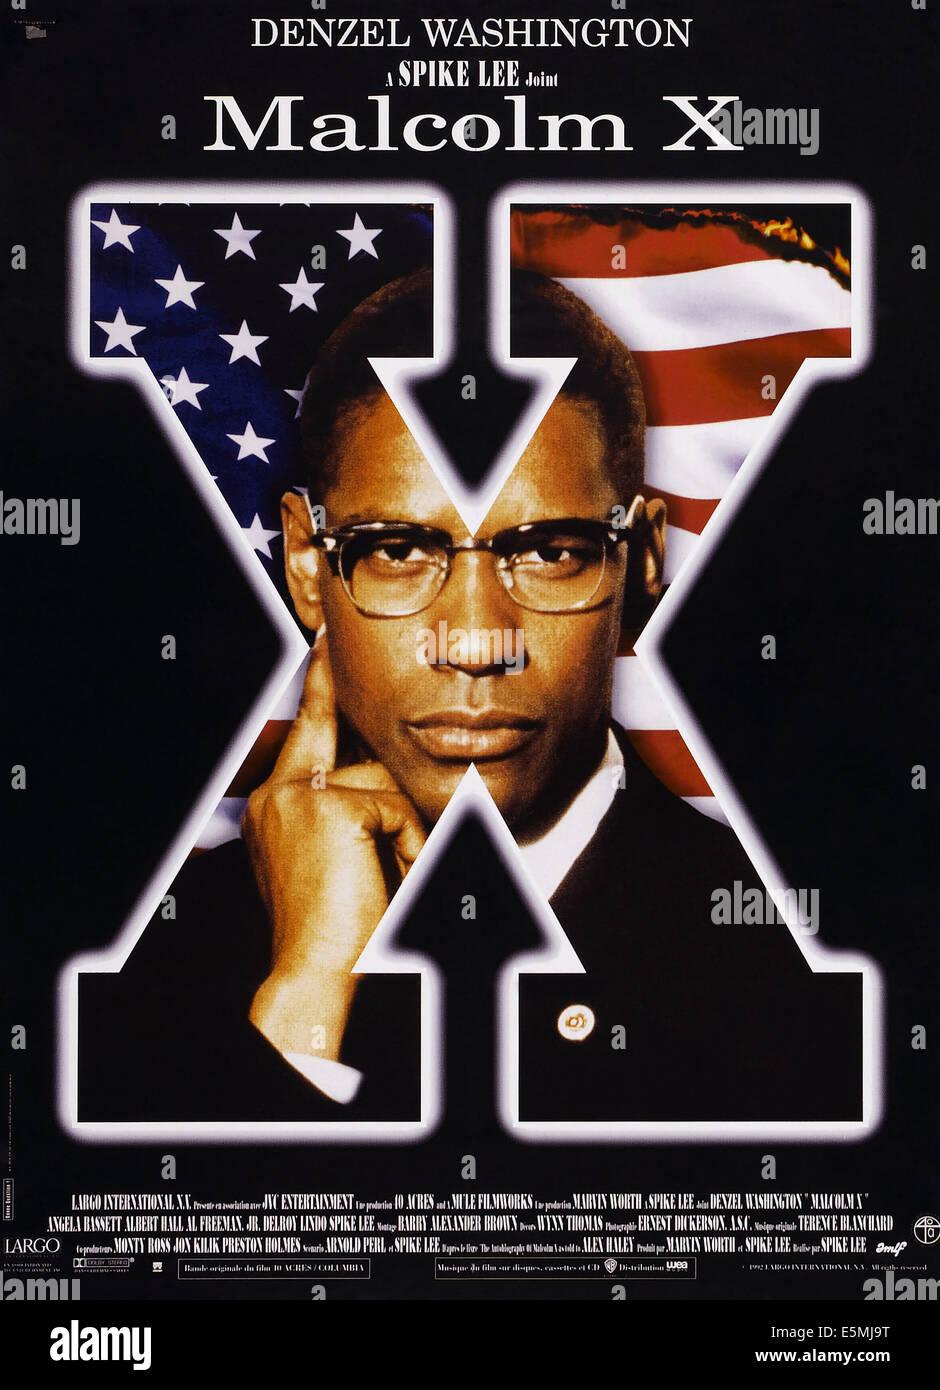 MALCOLM X, US poster, Denzel Washington, 1992, © Warner Brothers/courtesy Everett Collection - Stock Image